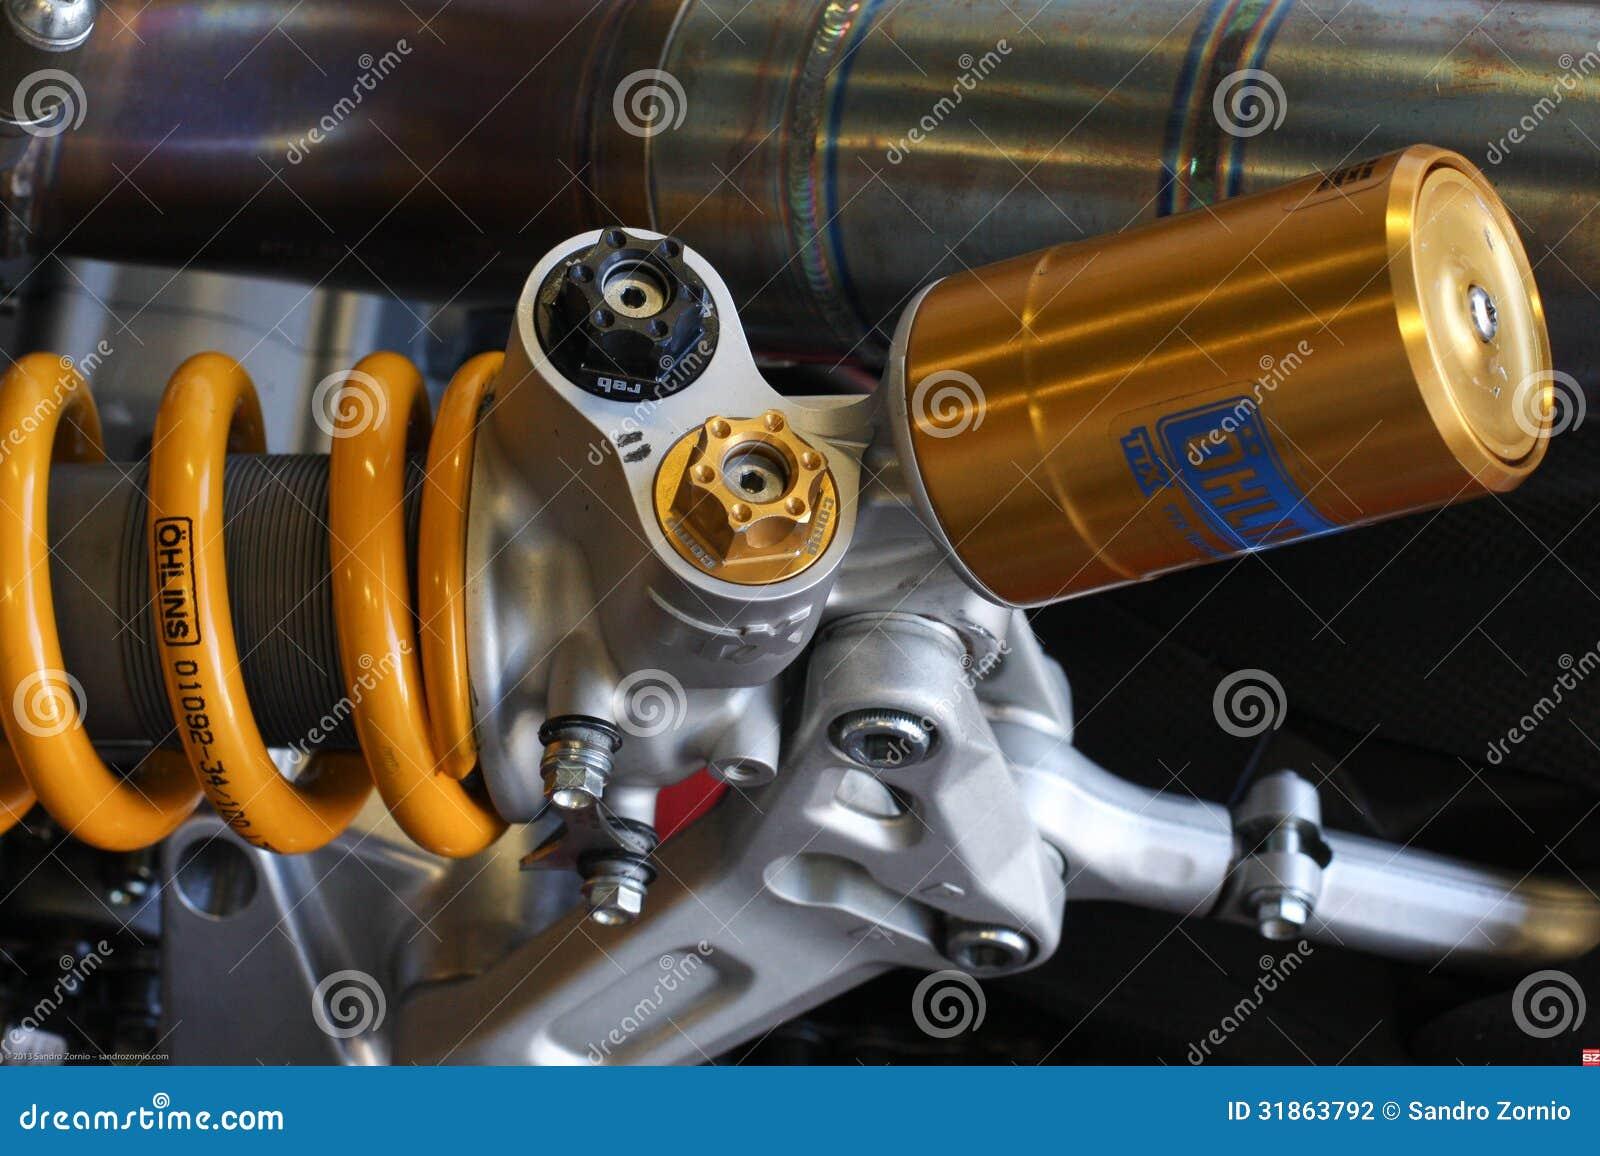 Ducati 1199 Panigale R engine and rear suspensionTeam Ducati Alstare Superbike WSBK